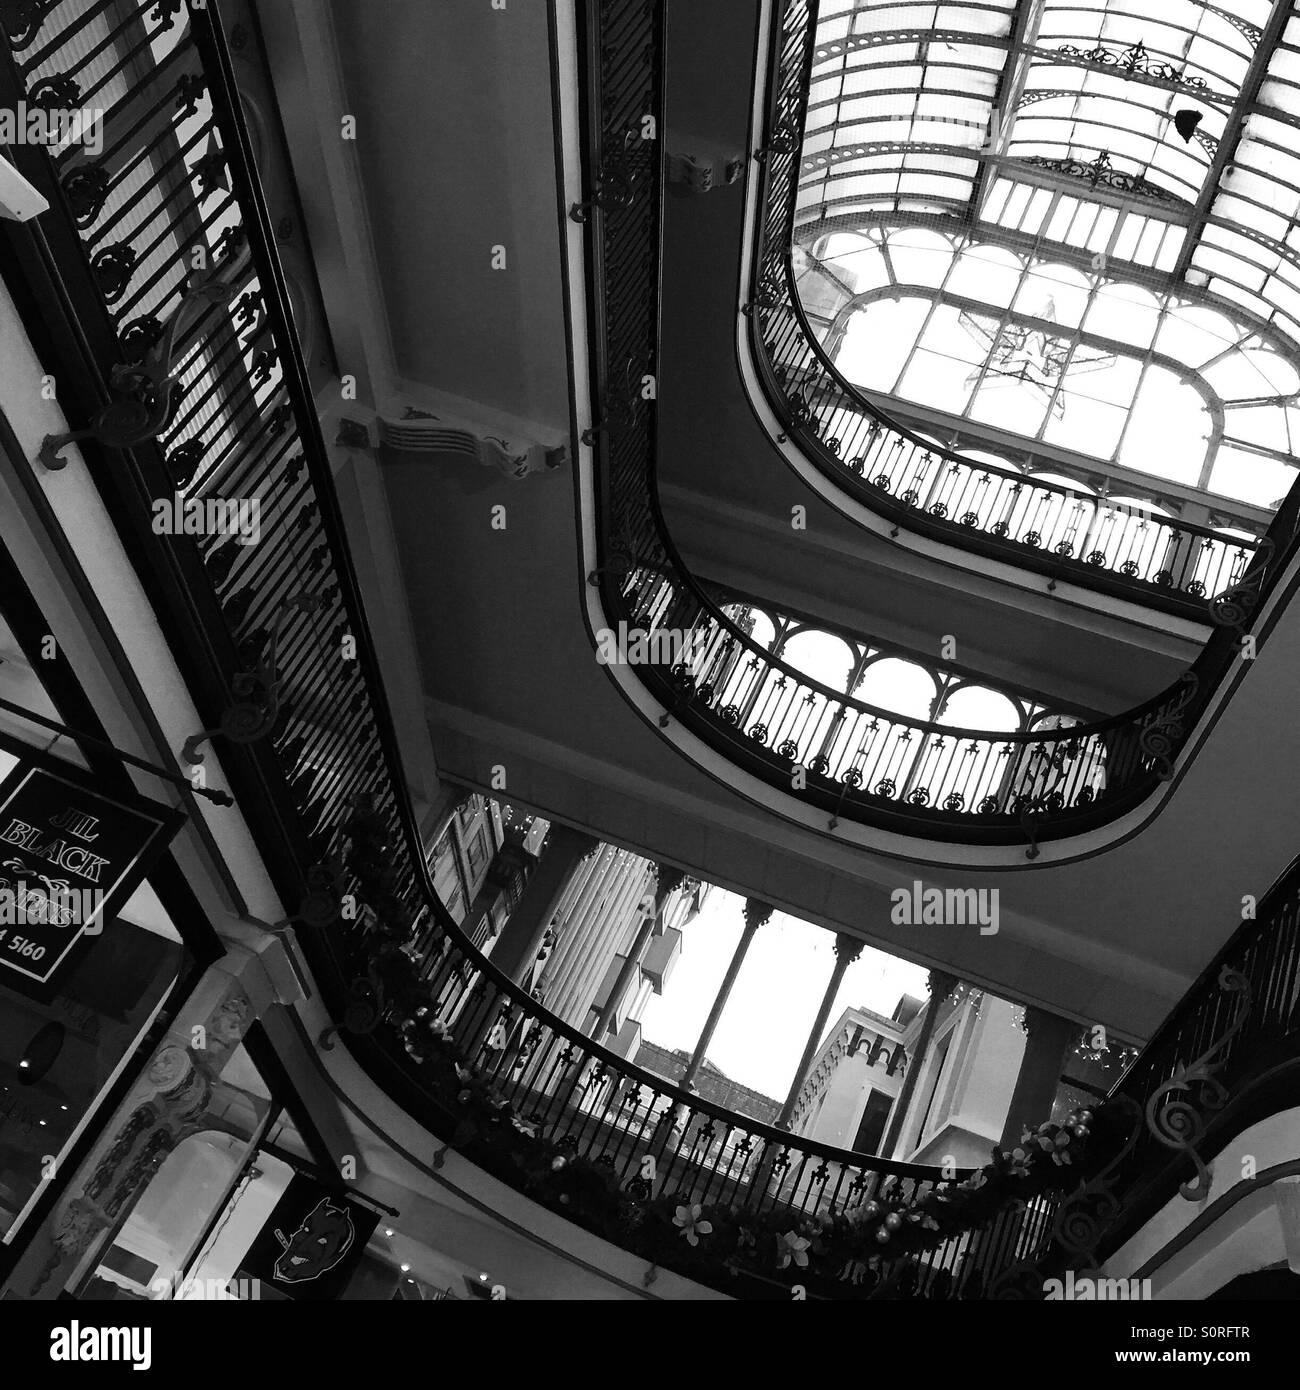 Barton Arcade in Manchester city centre - Stock Image